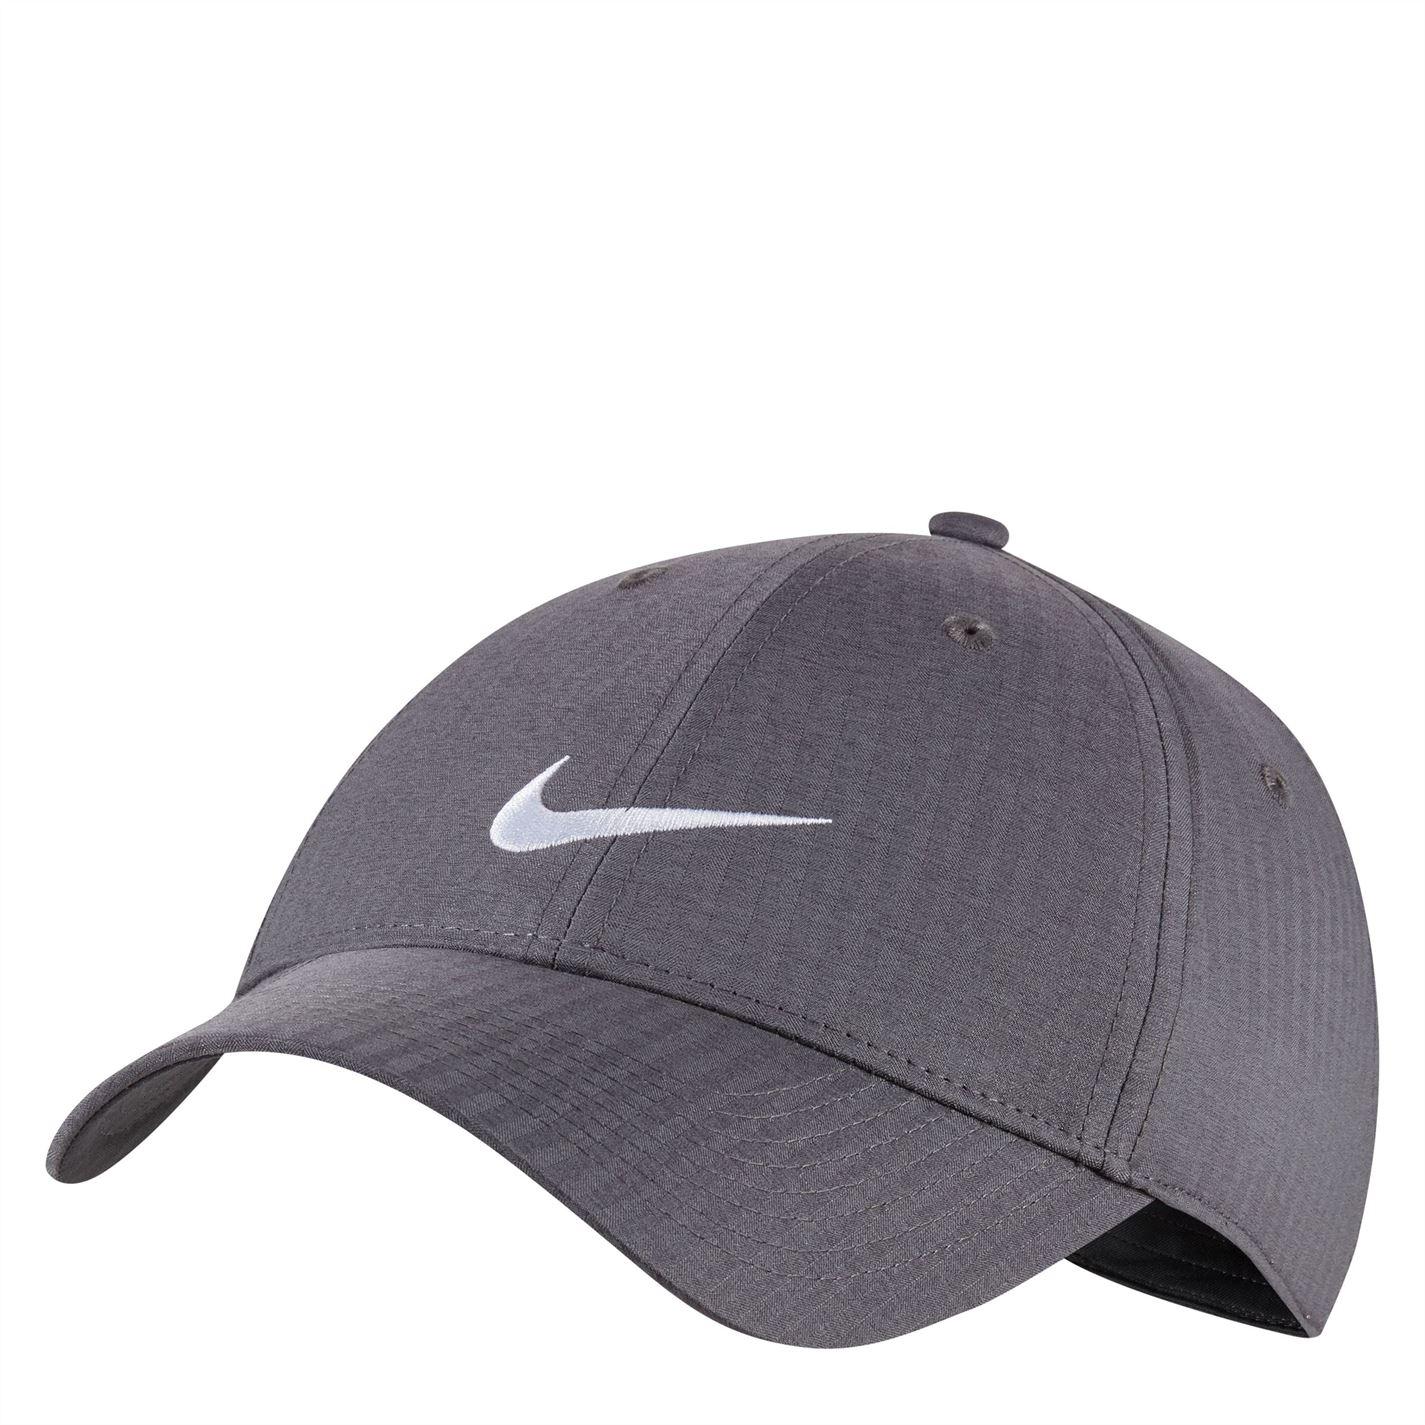 Nike Legacy 91 Tech Swoosh Cap Unisex